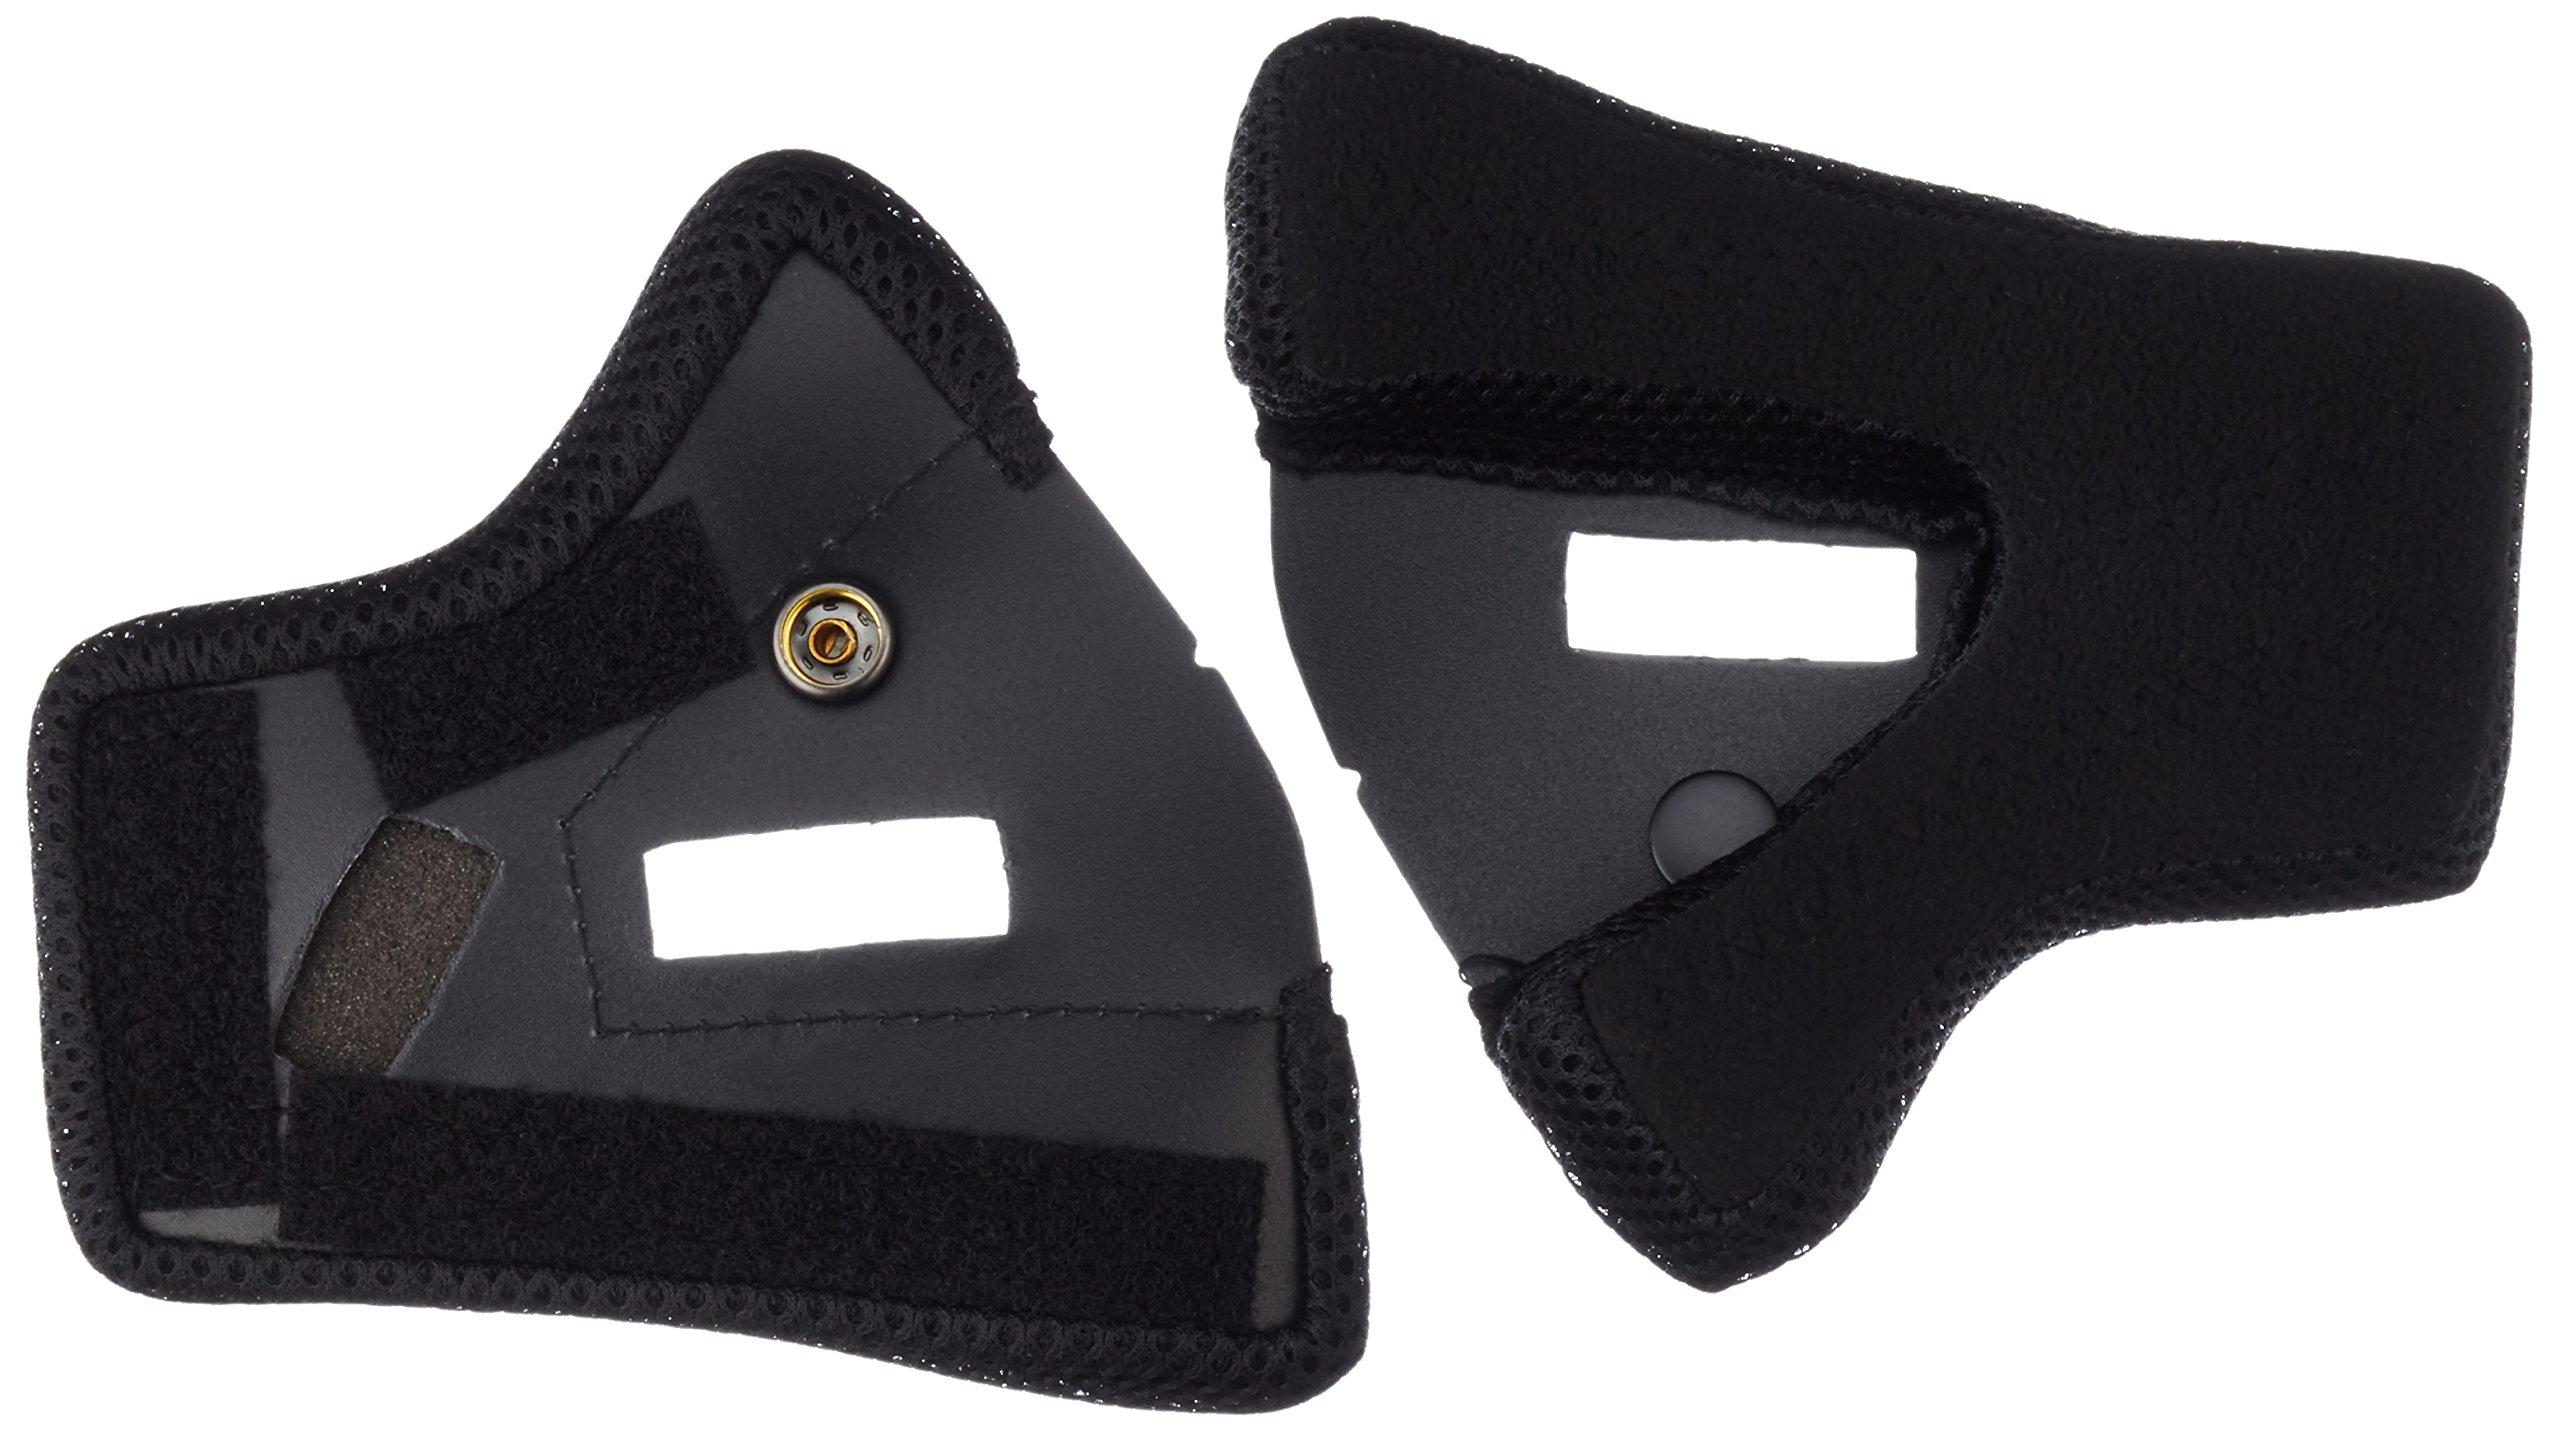 Fox Rampage Cheek Pads [Black] Xl Black Xlarge 03283-001-XL